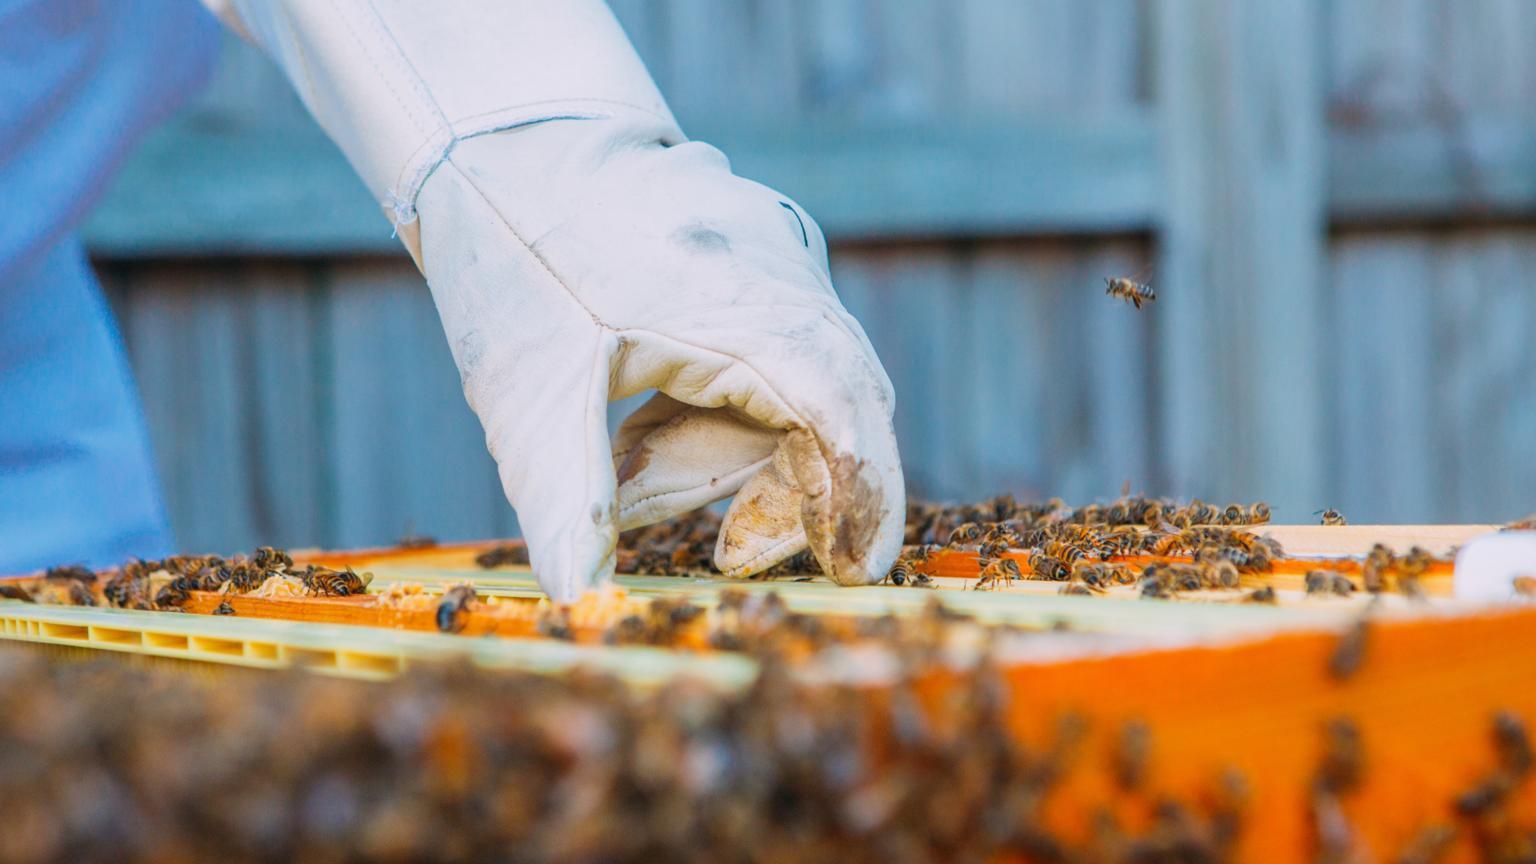 registre elevage apicole gratuit